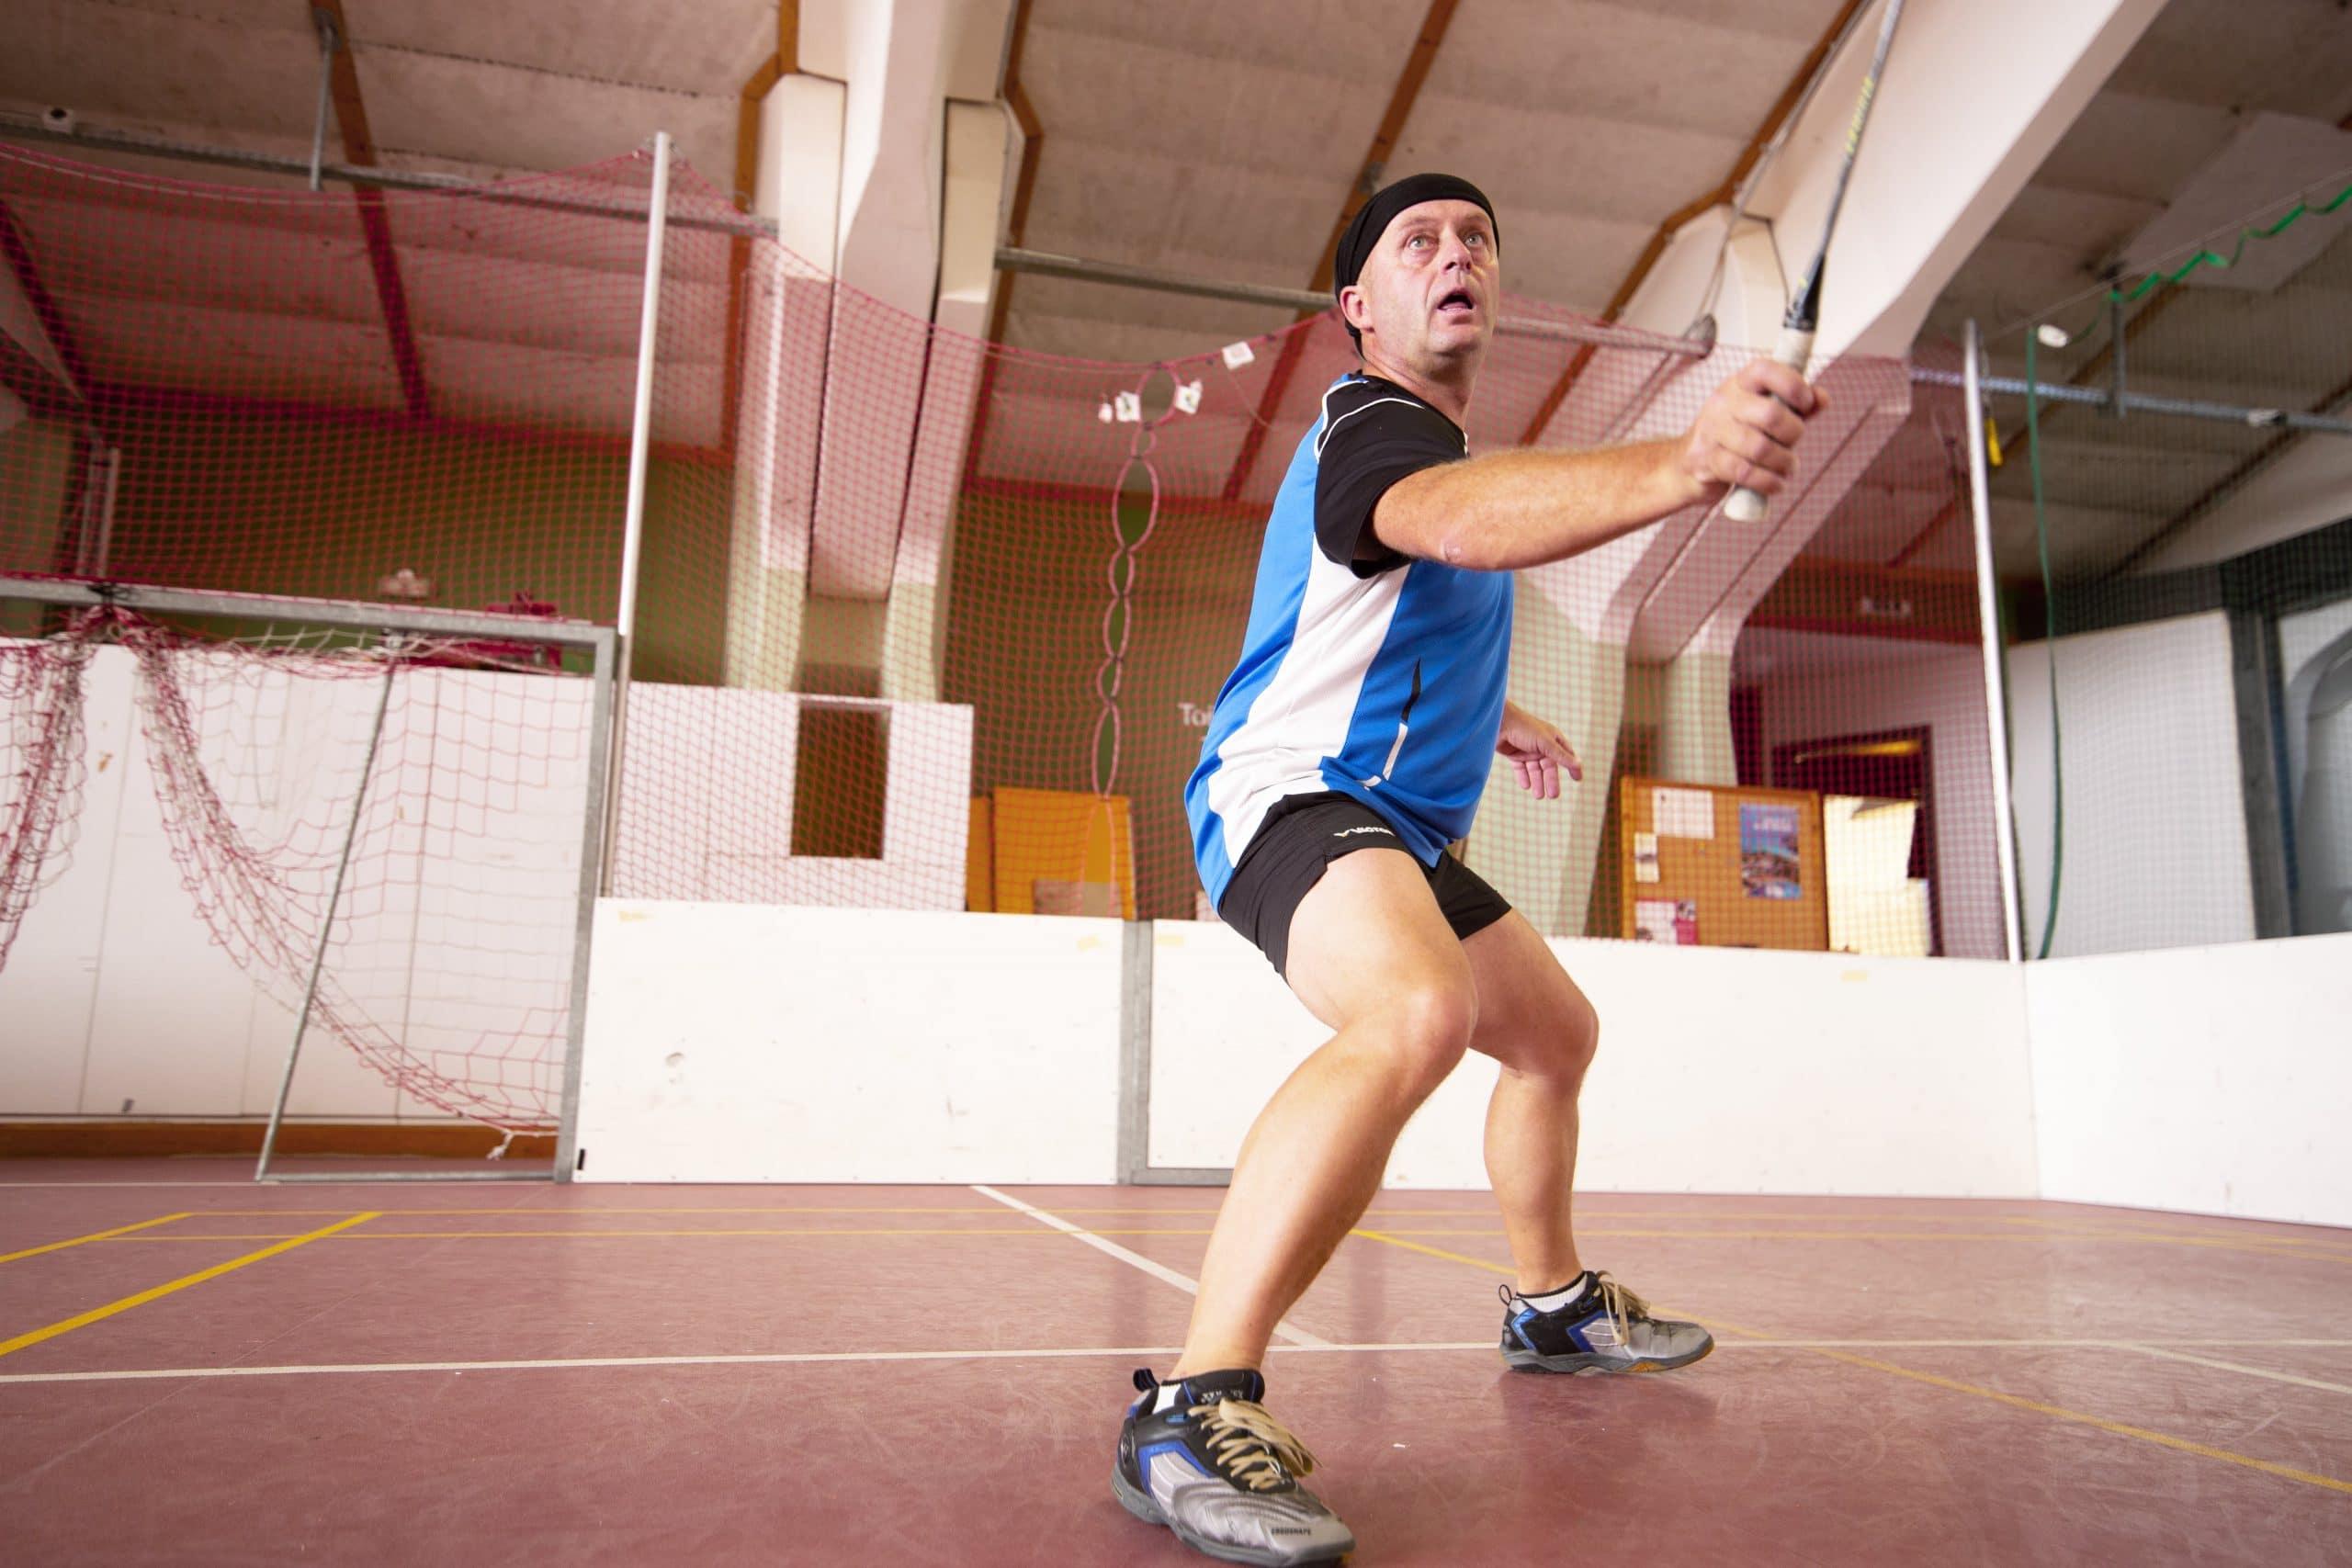 Federball Player